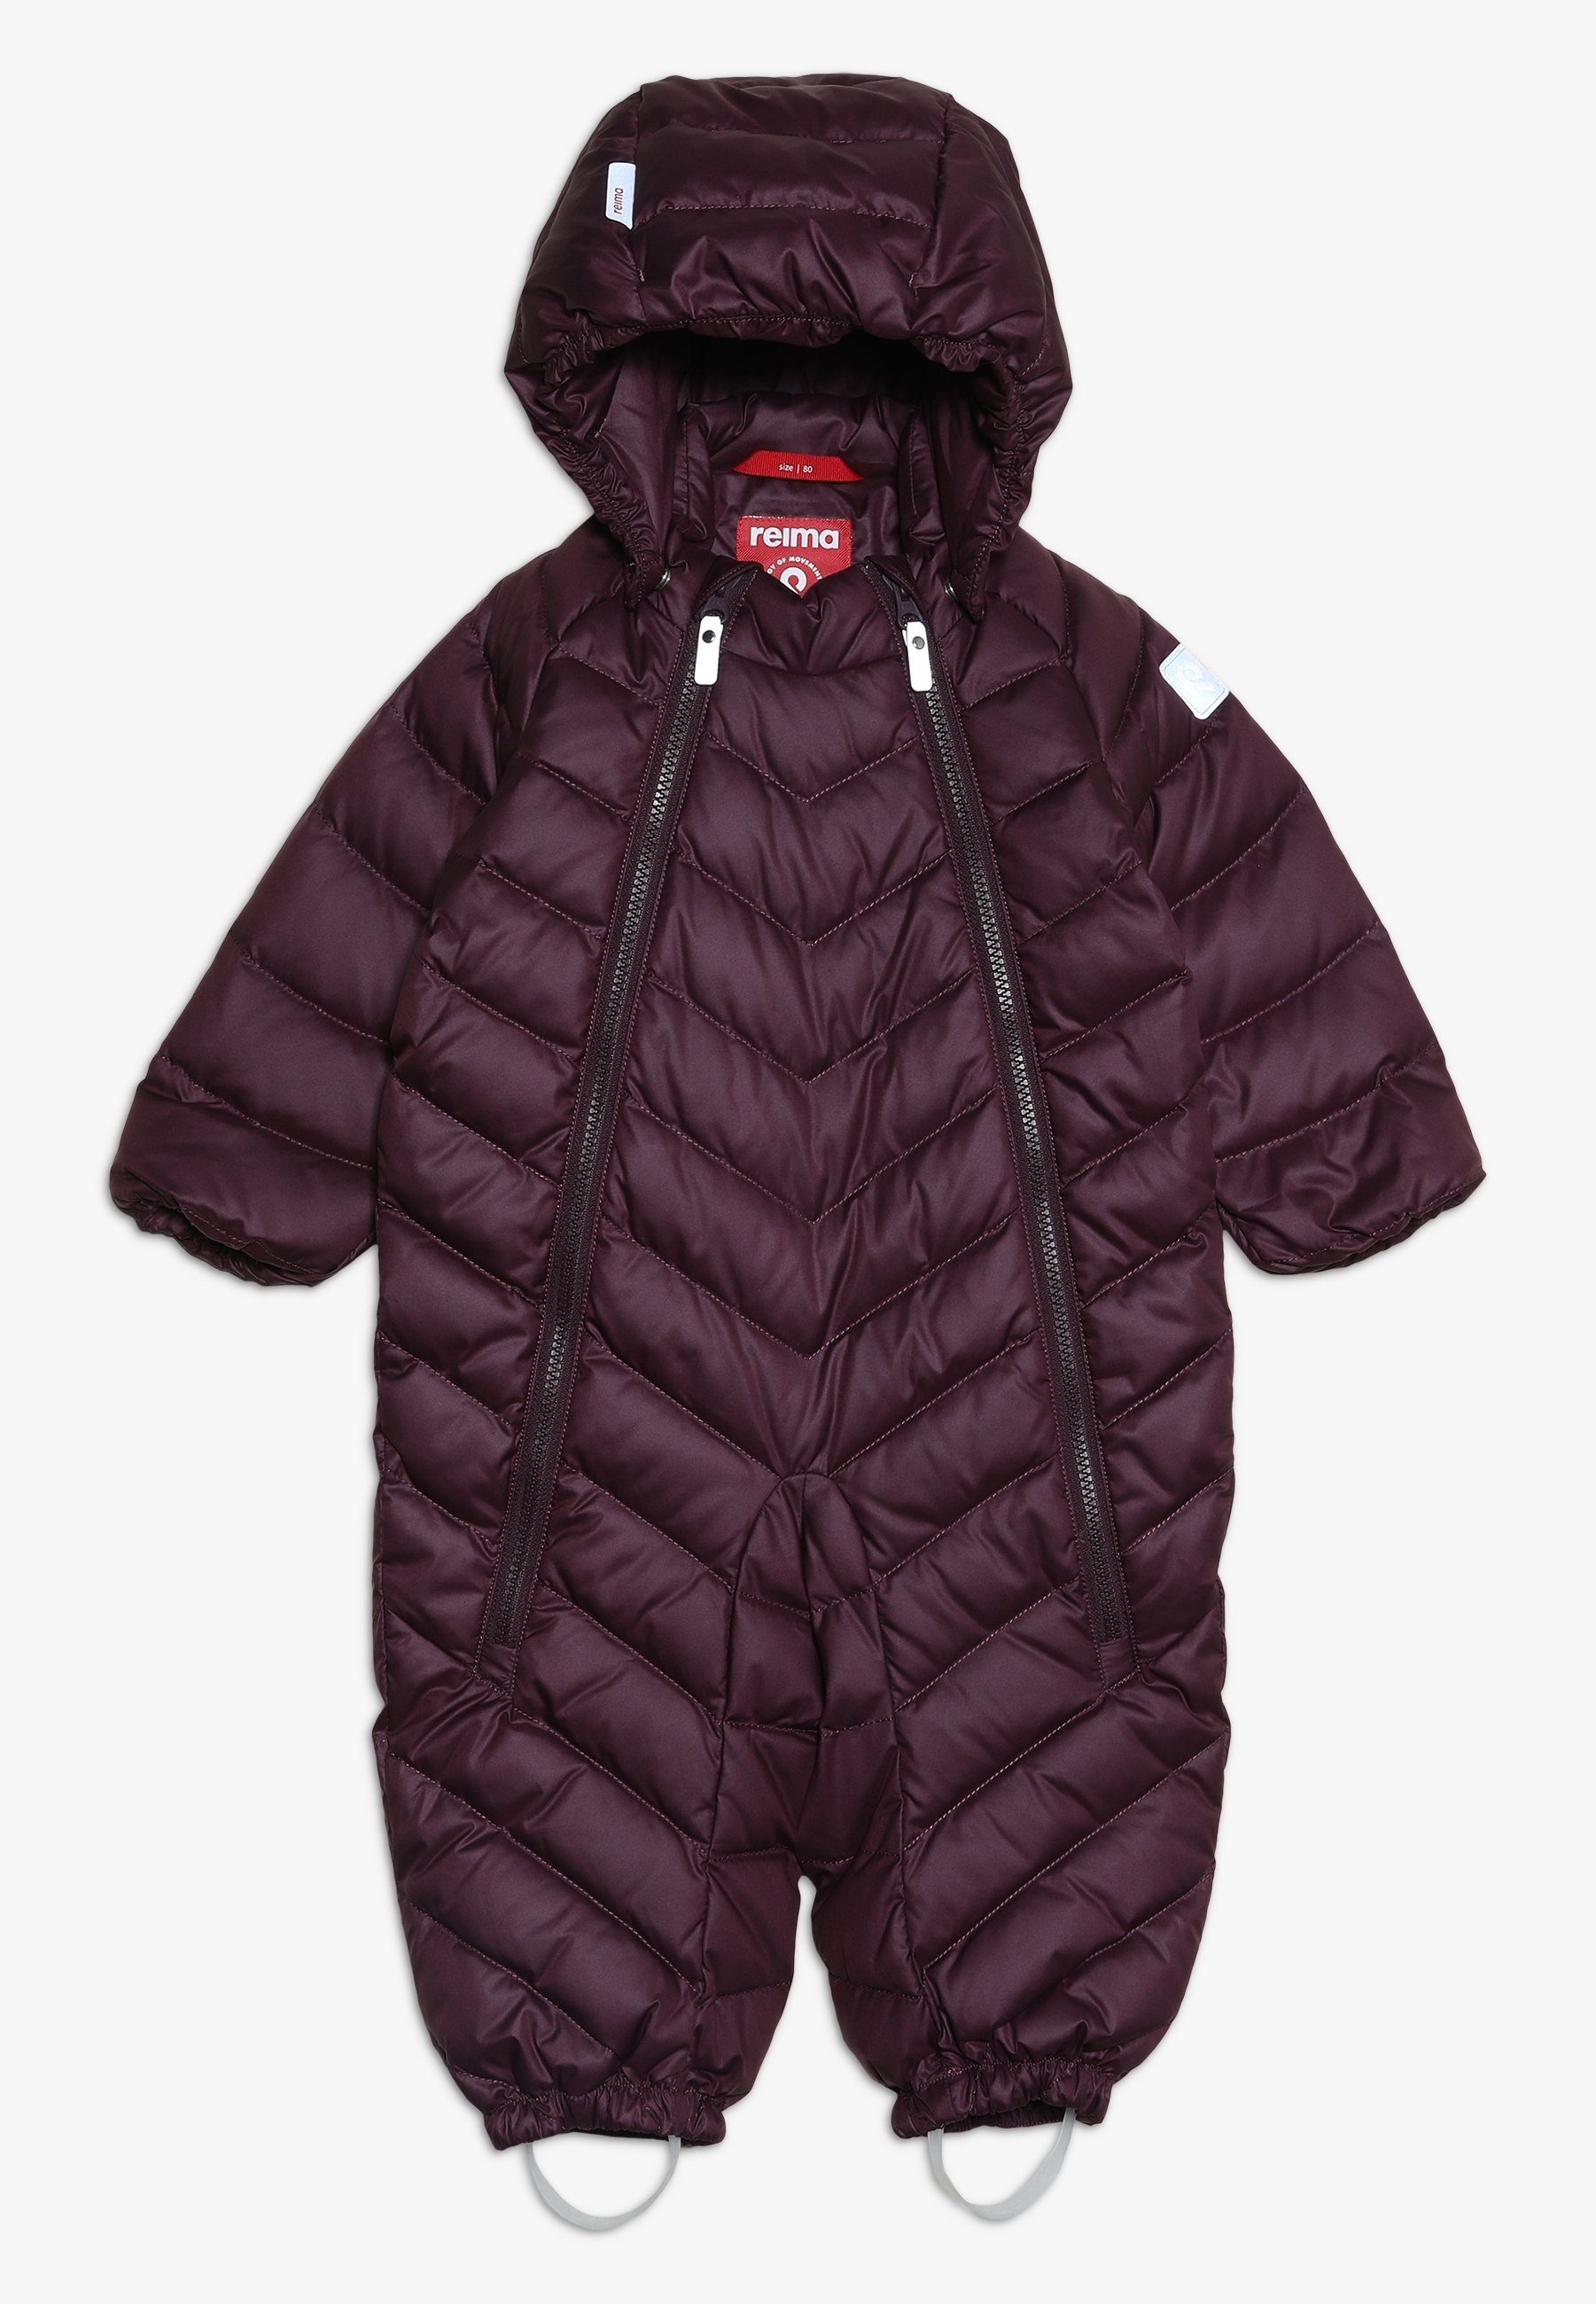 Småbarn | Reima barnkläder